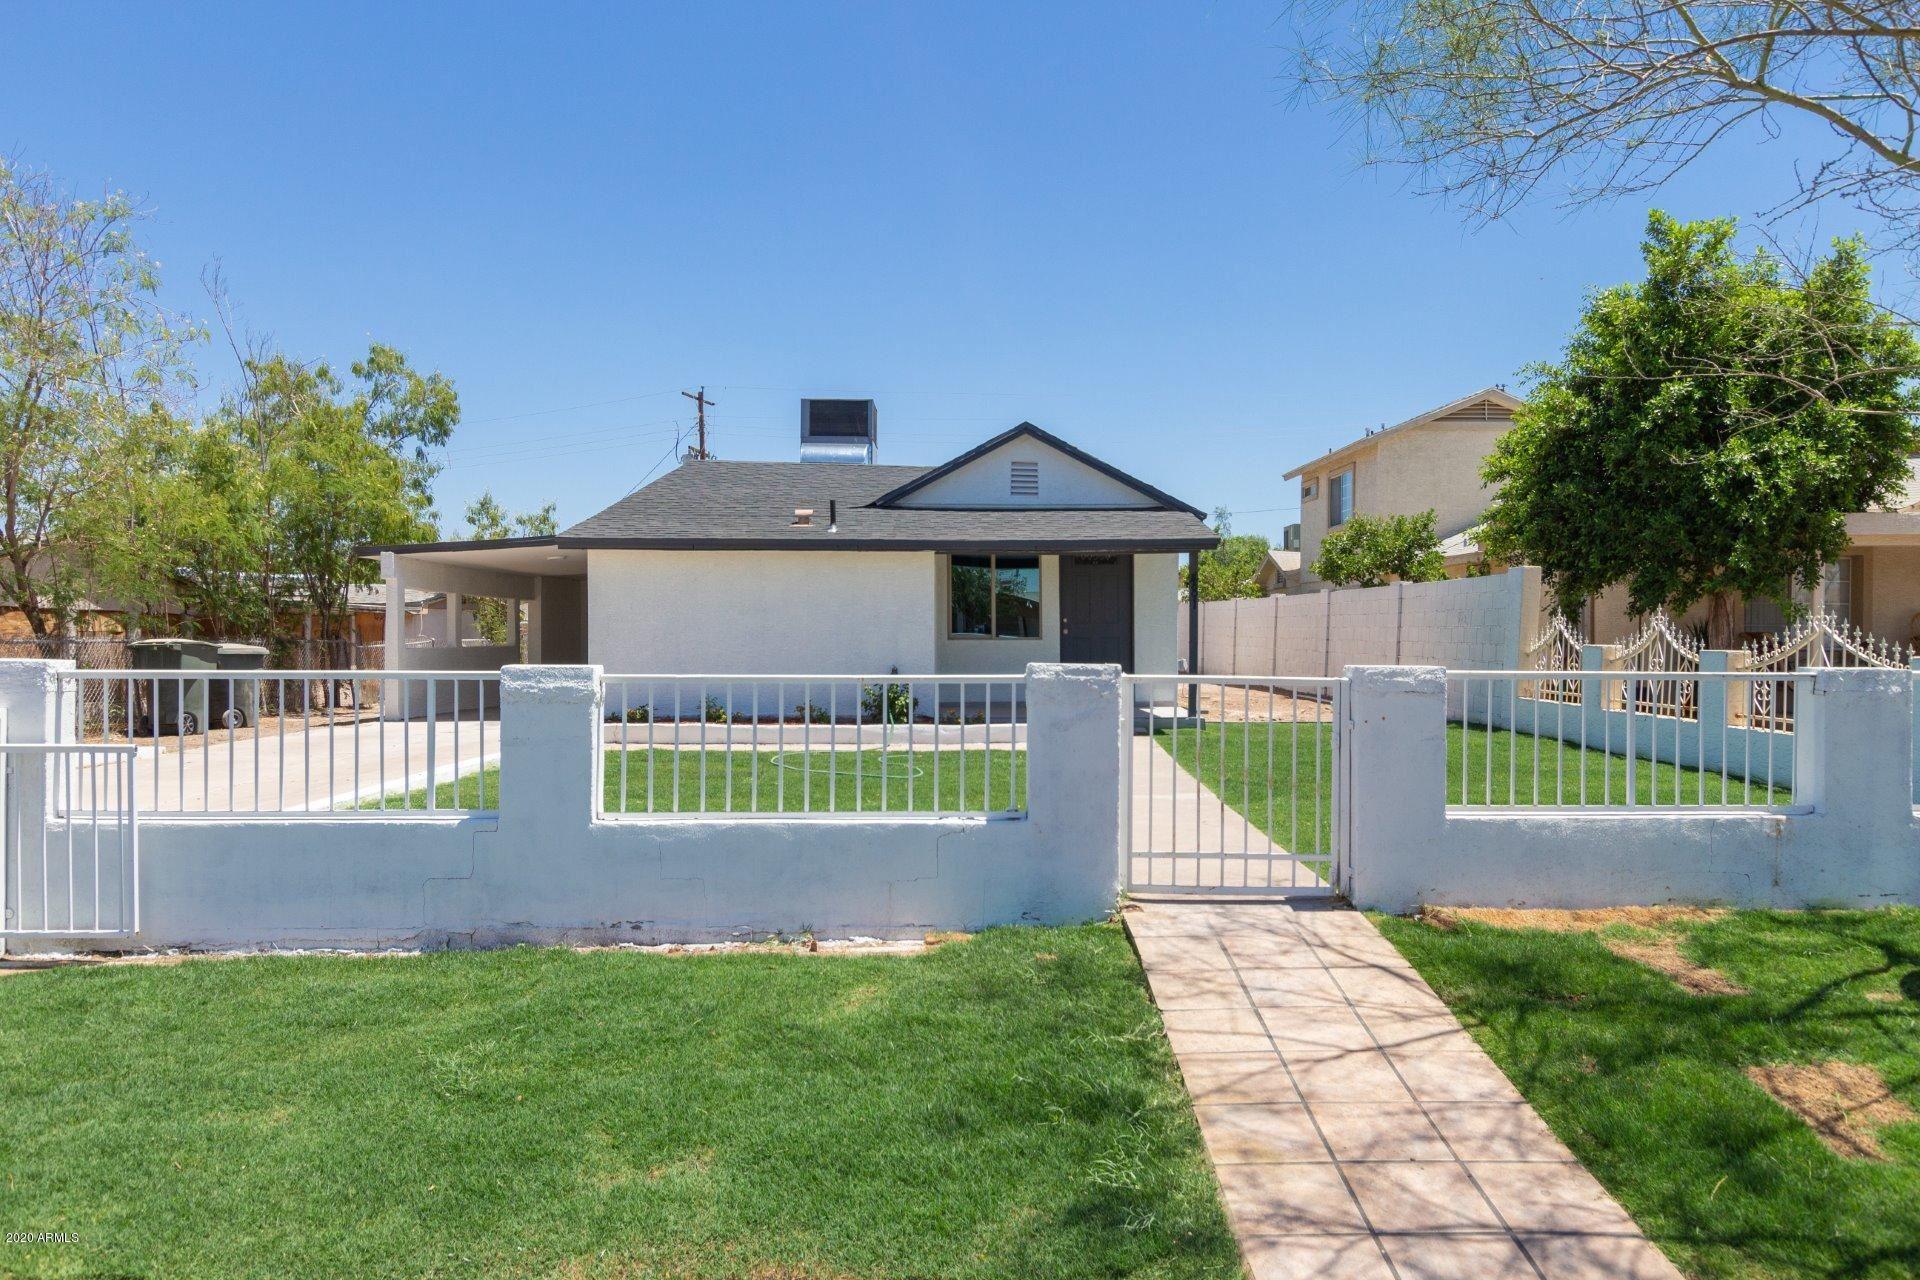 Property Image Of 4811 S 10Th Street In Phoenix, Az